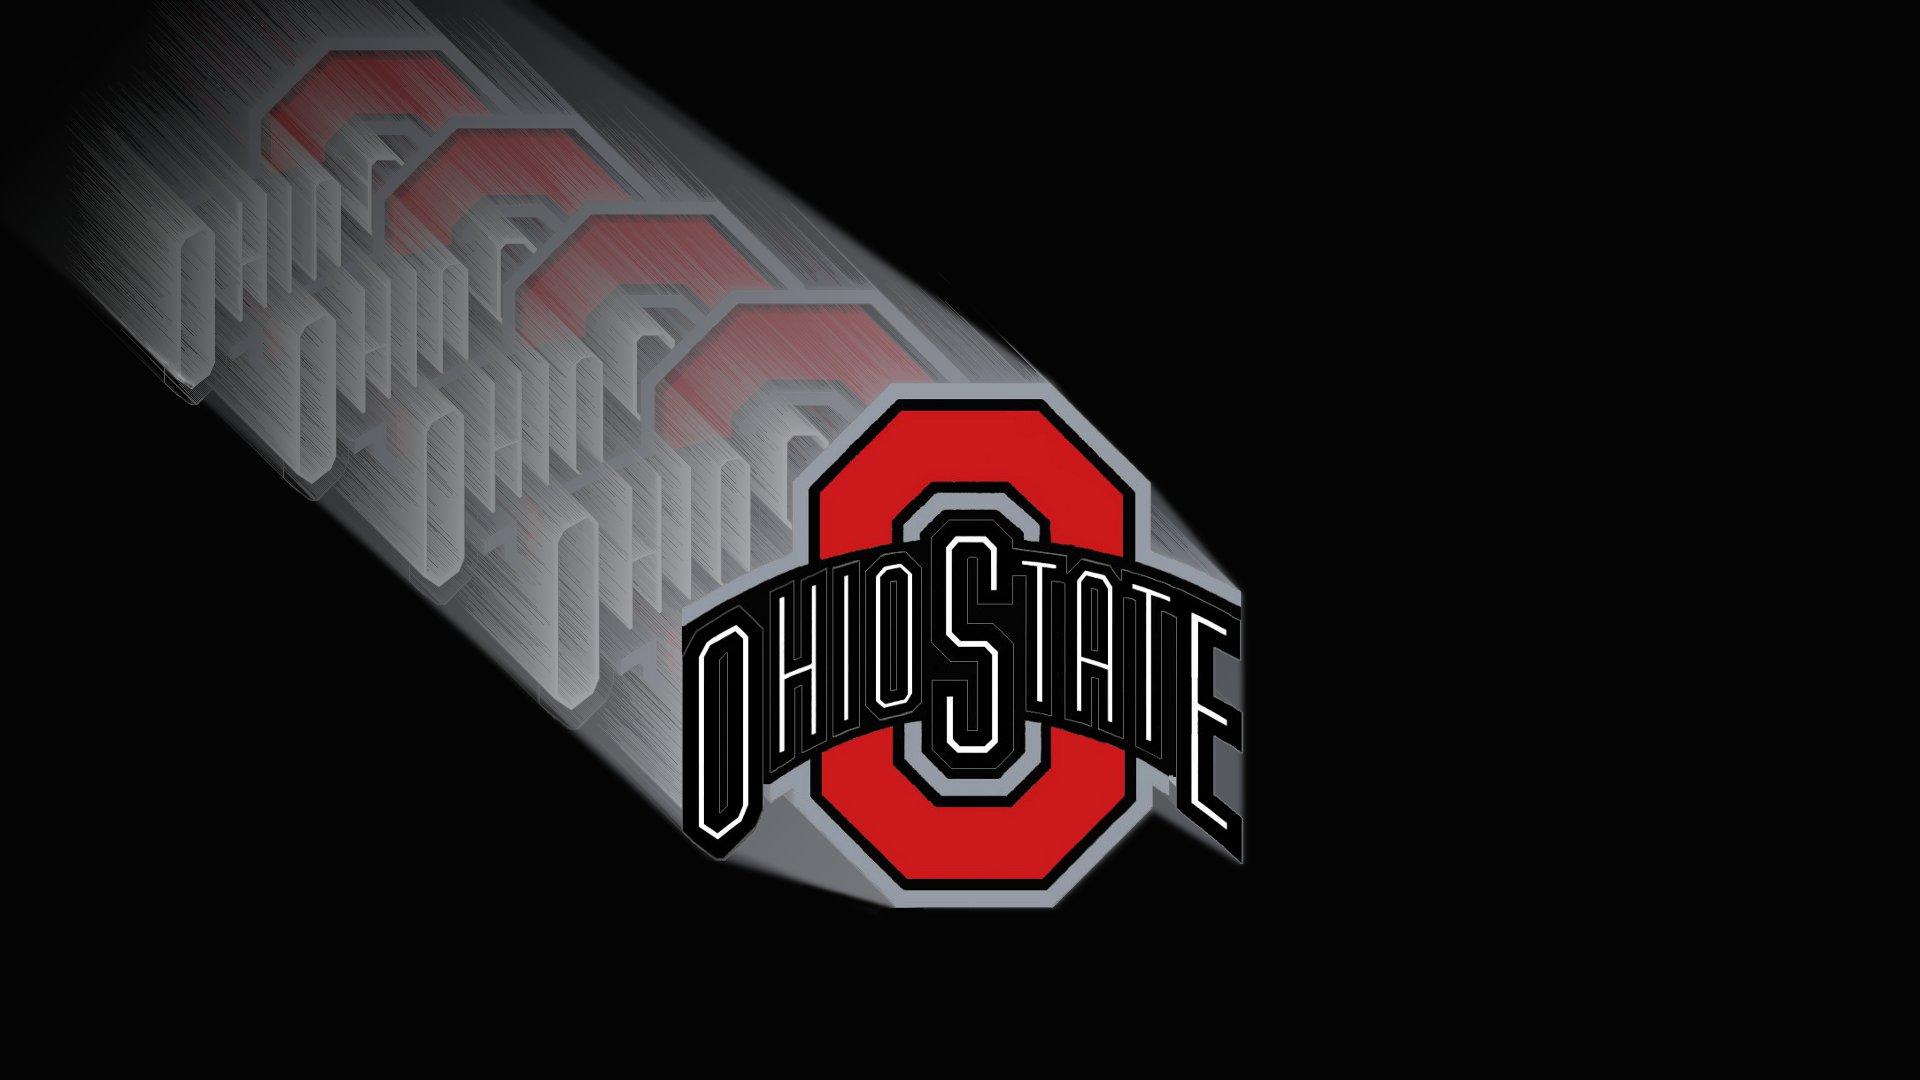 OSU Wallpaper 246 - Ohio State Football Wallpaper (29127252) - Fanpop